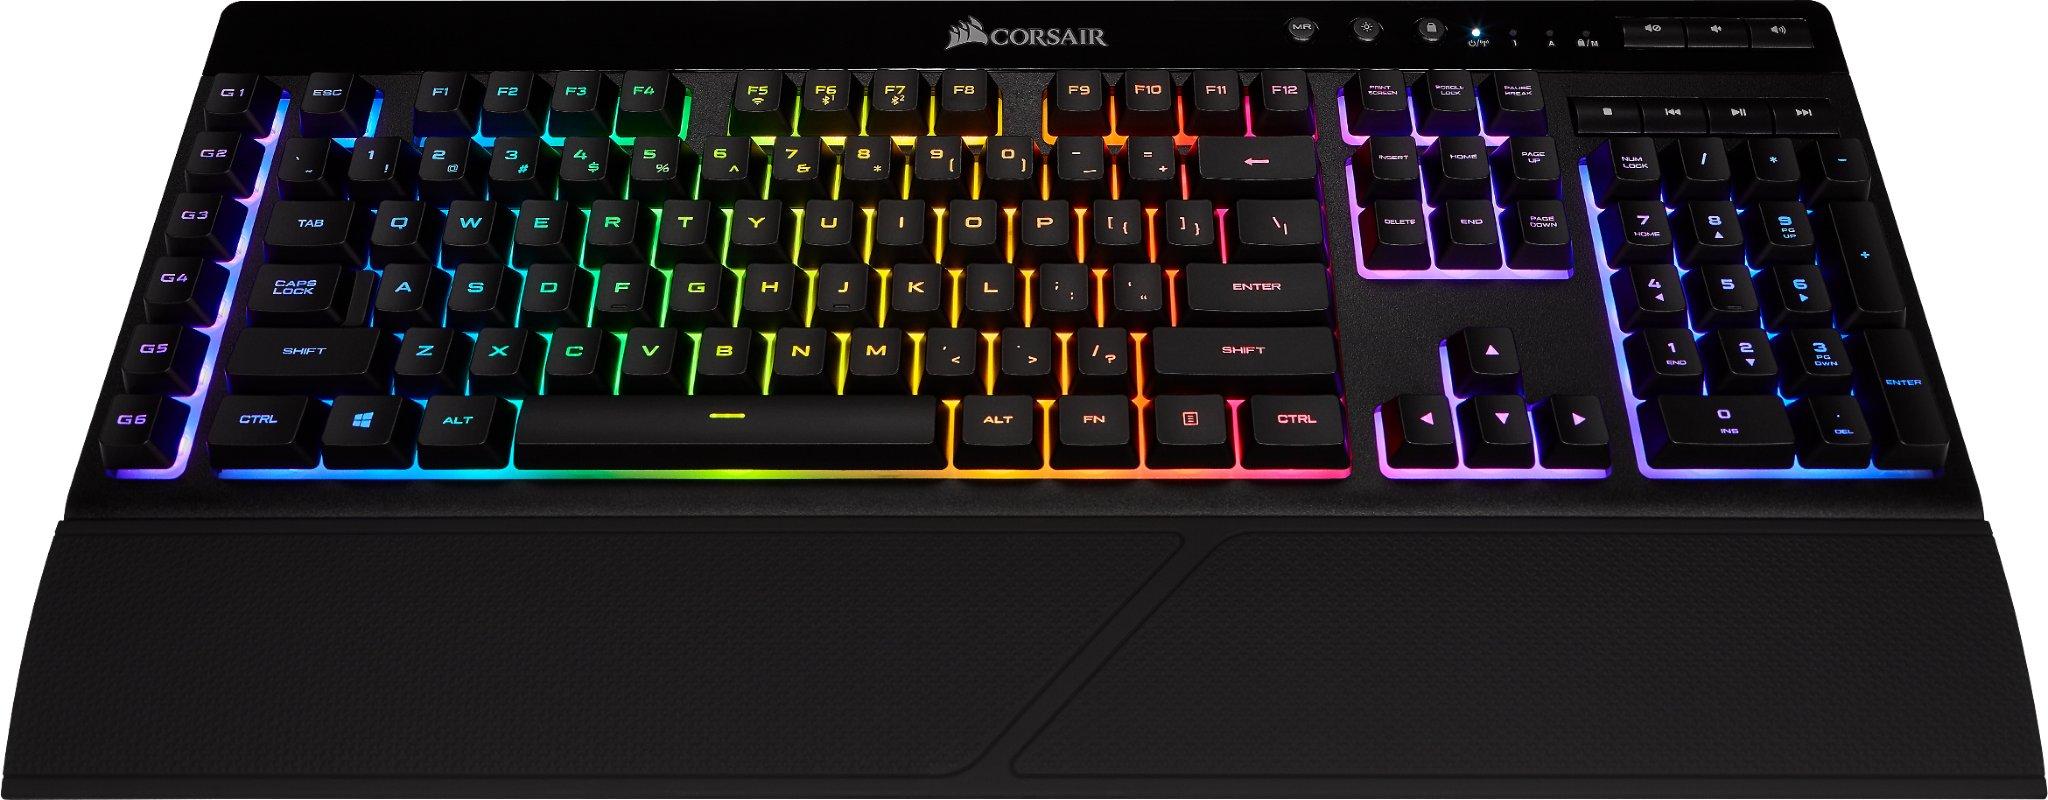 Corsair K57 RGB Trådløs Tastatur Nordisk Svart   Dustinhome.no